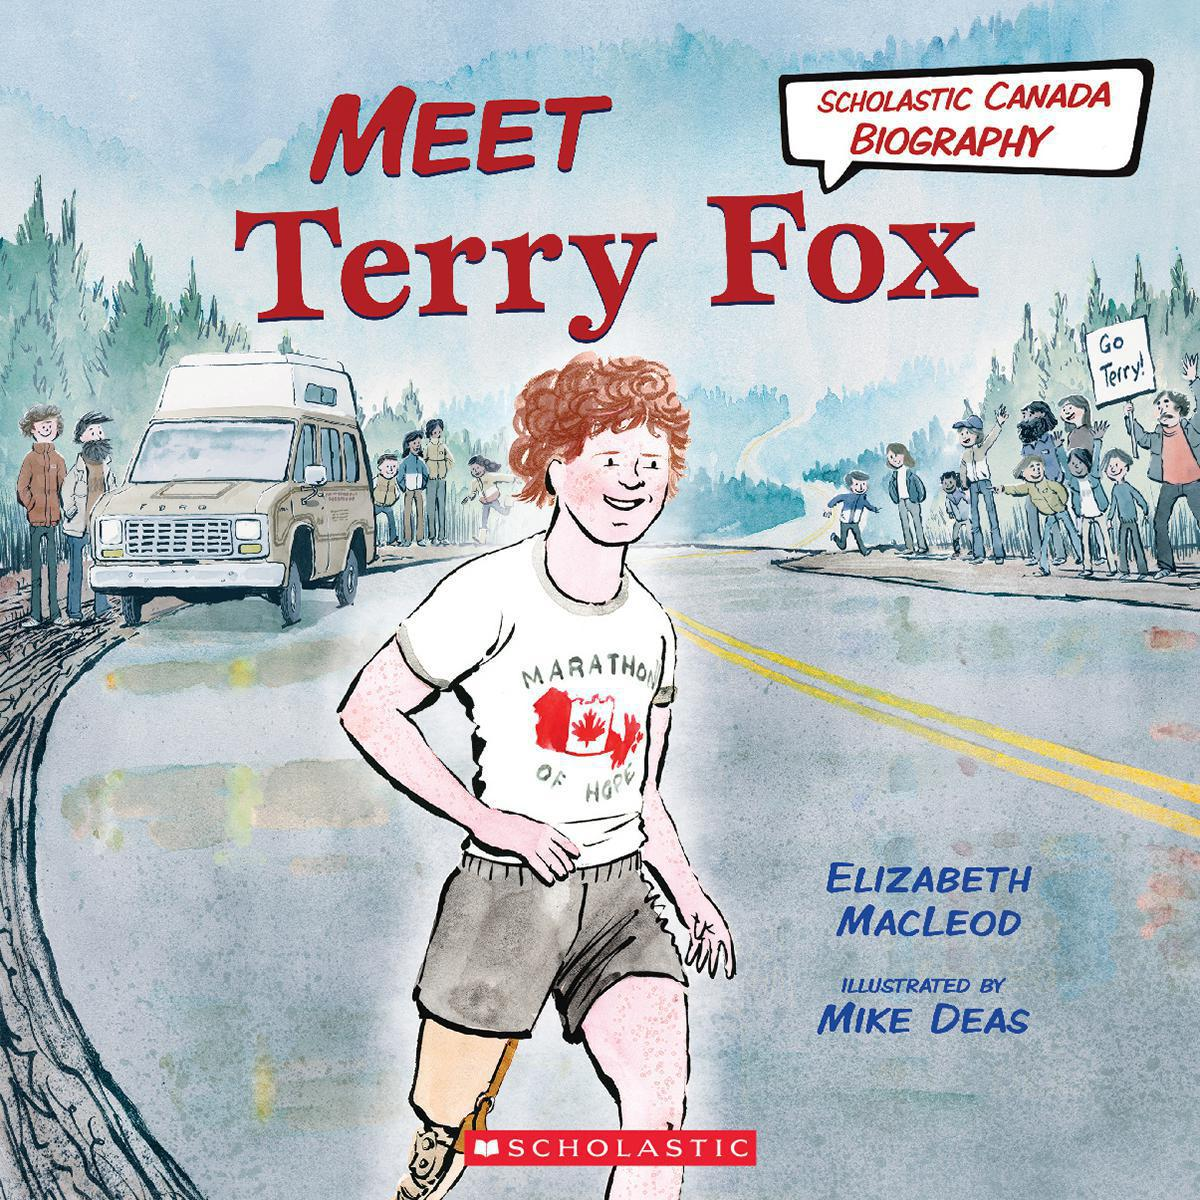 Scholastic Canada Biography: Meet Terry Fox